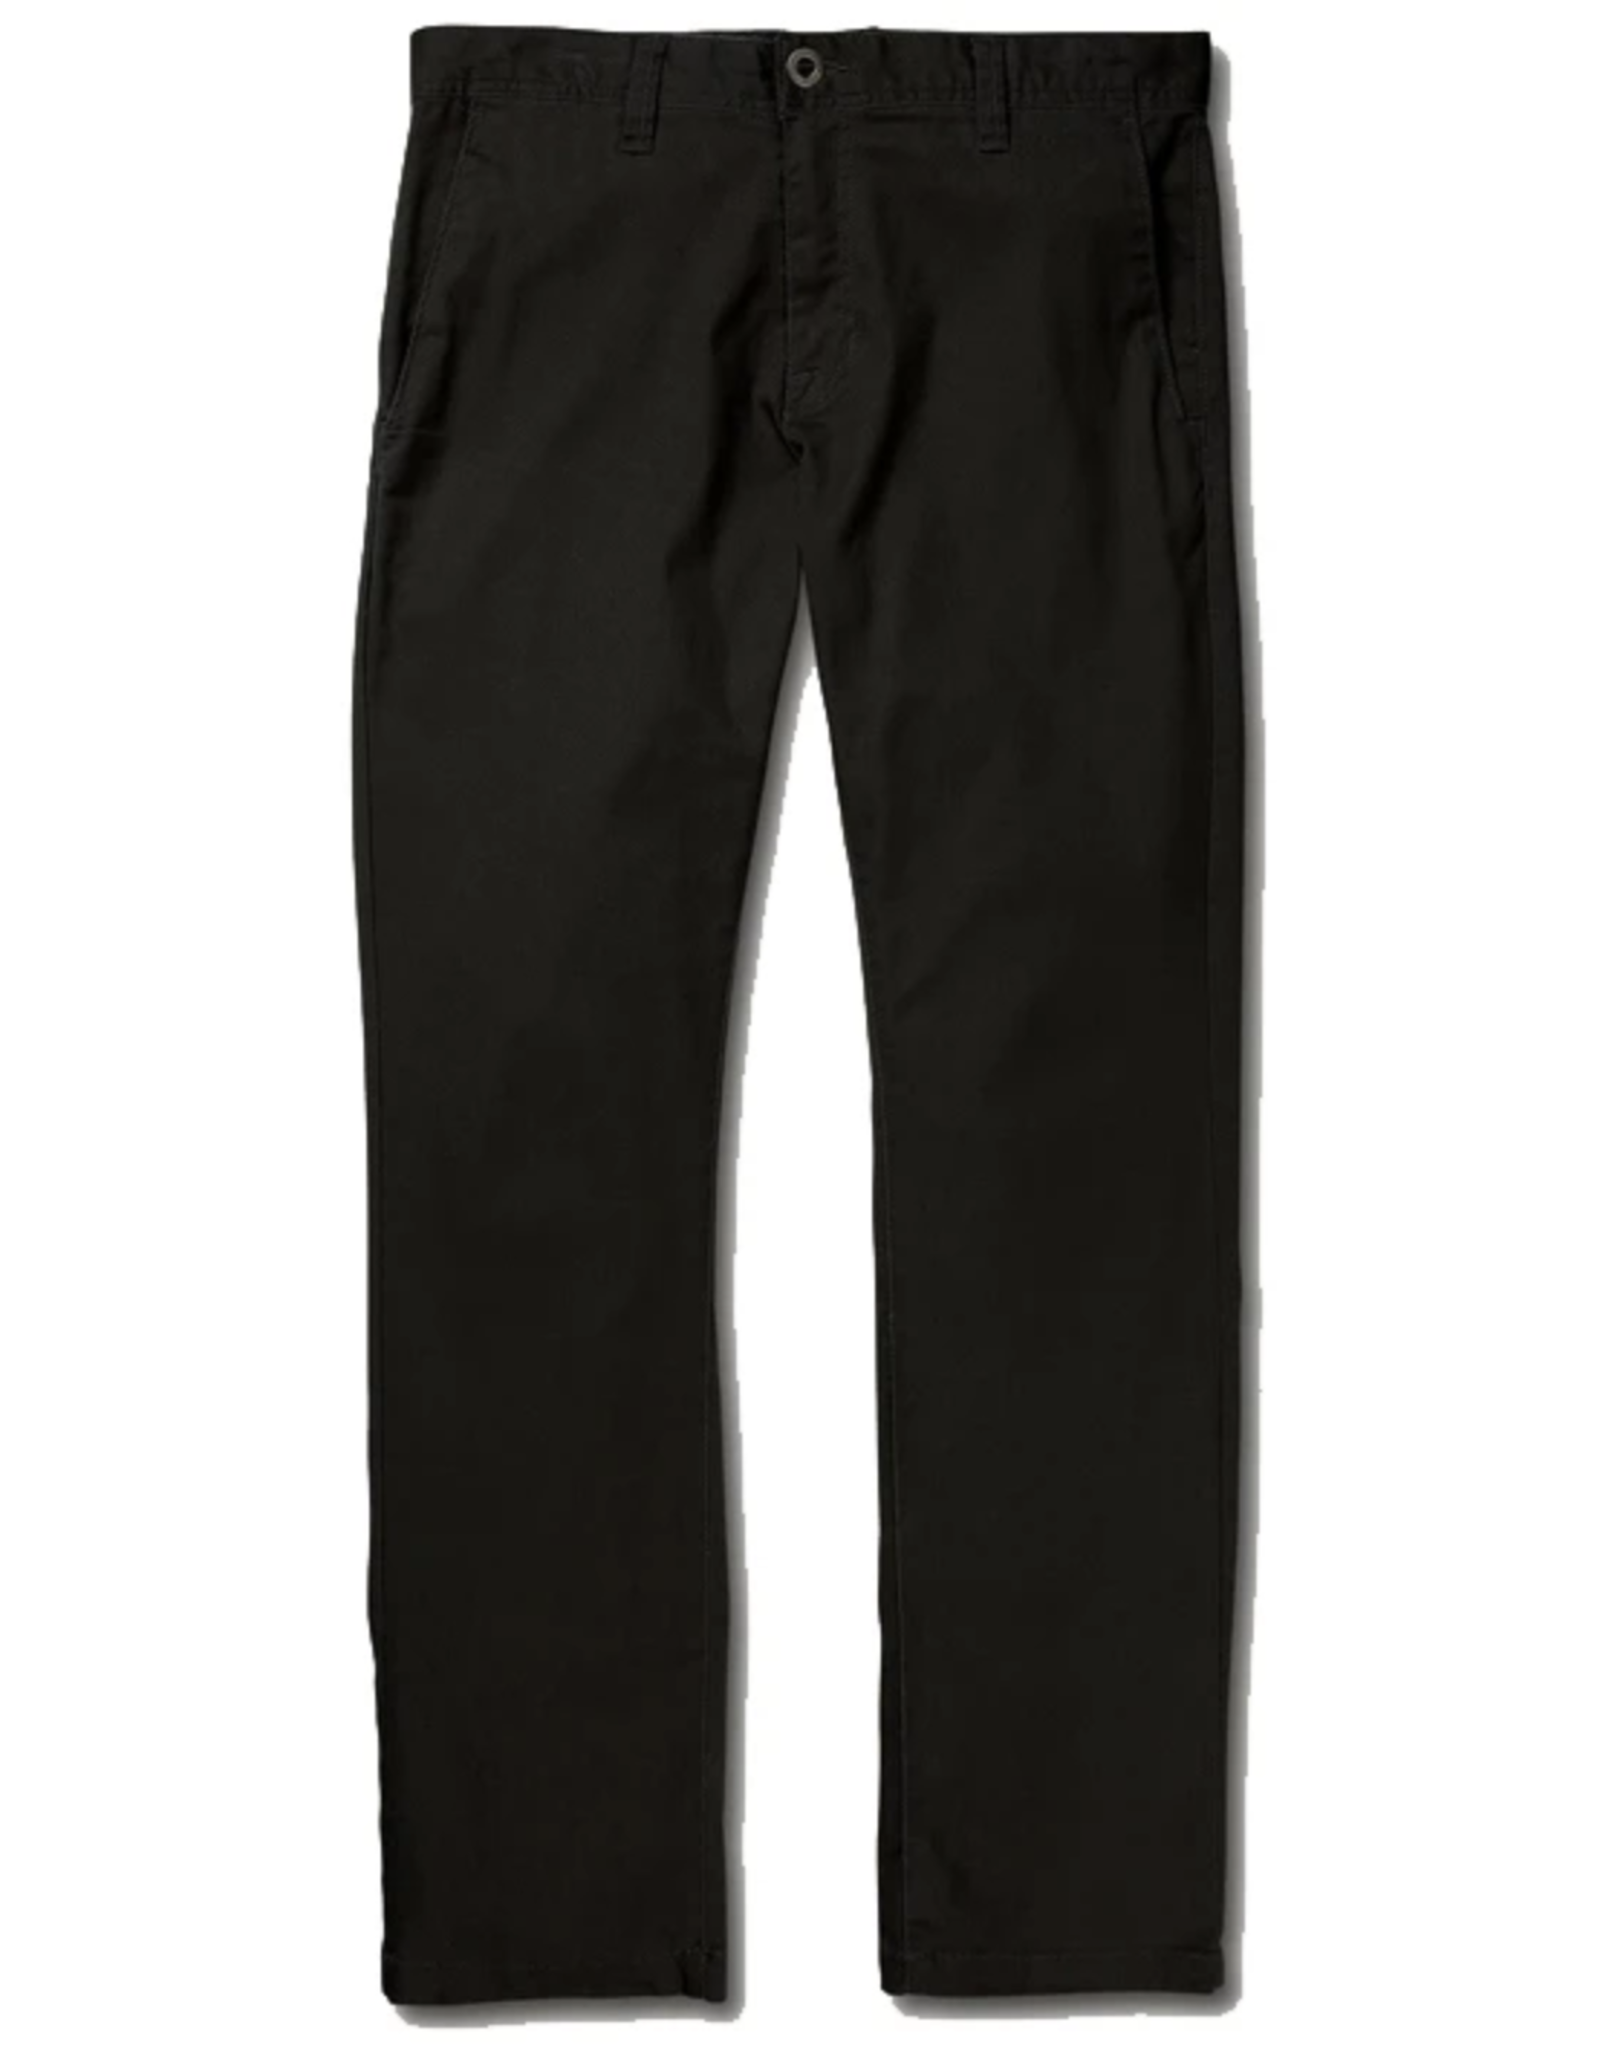 Volcom Frickin Modern Stretch Pants - Black